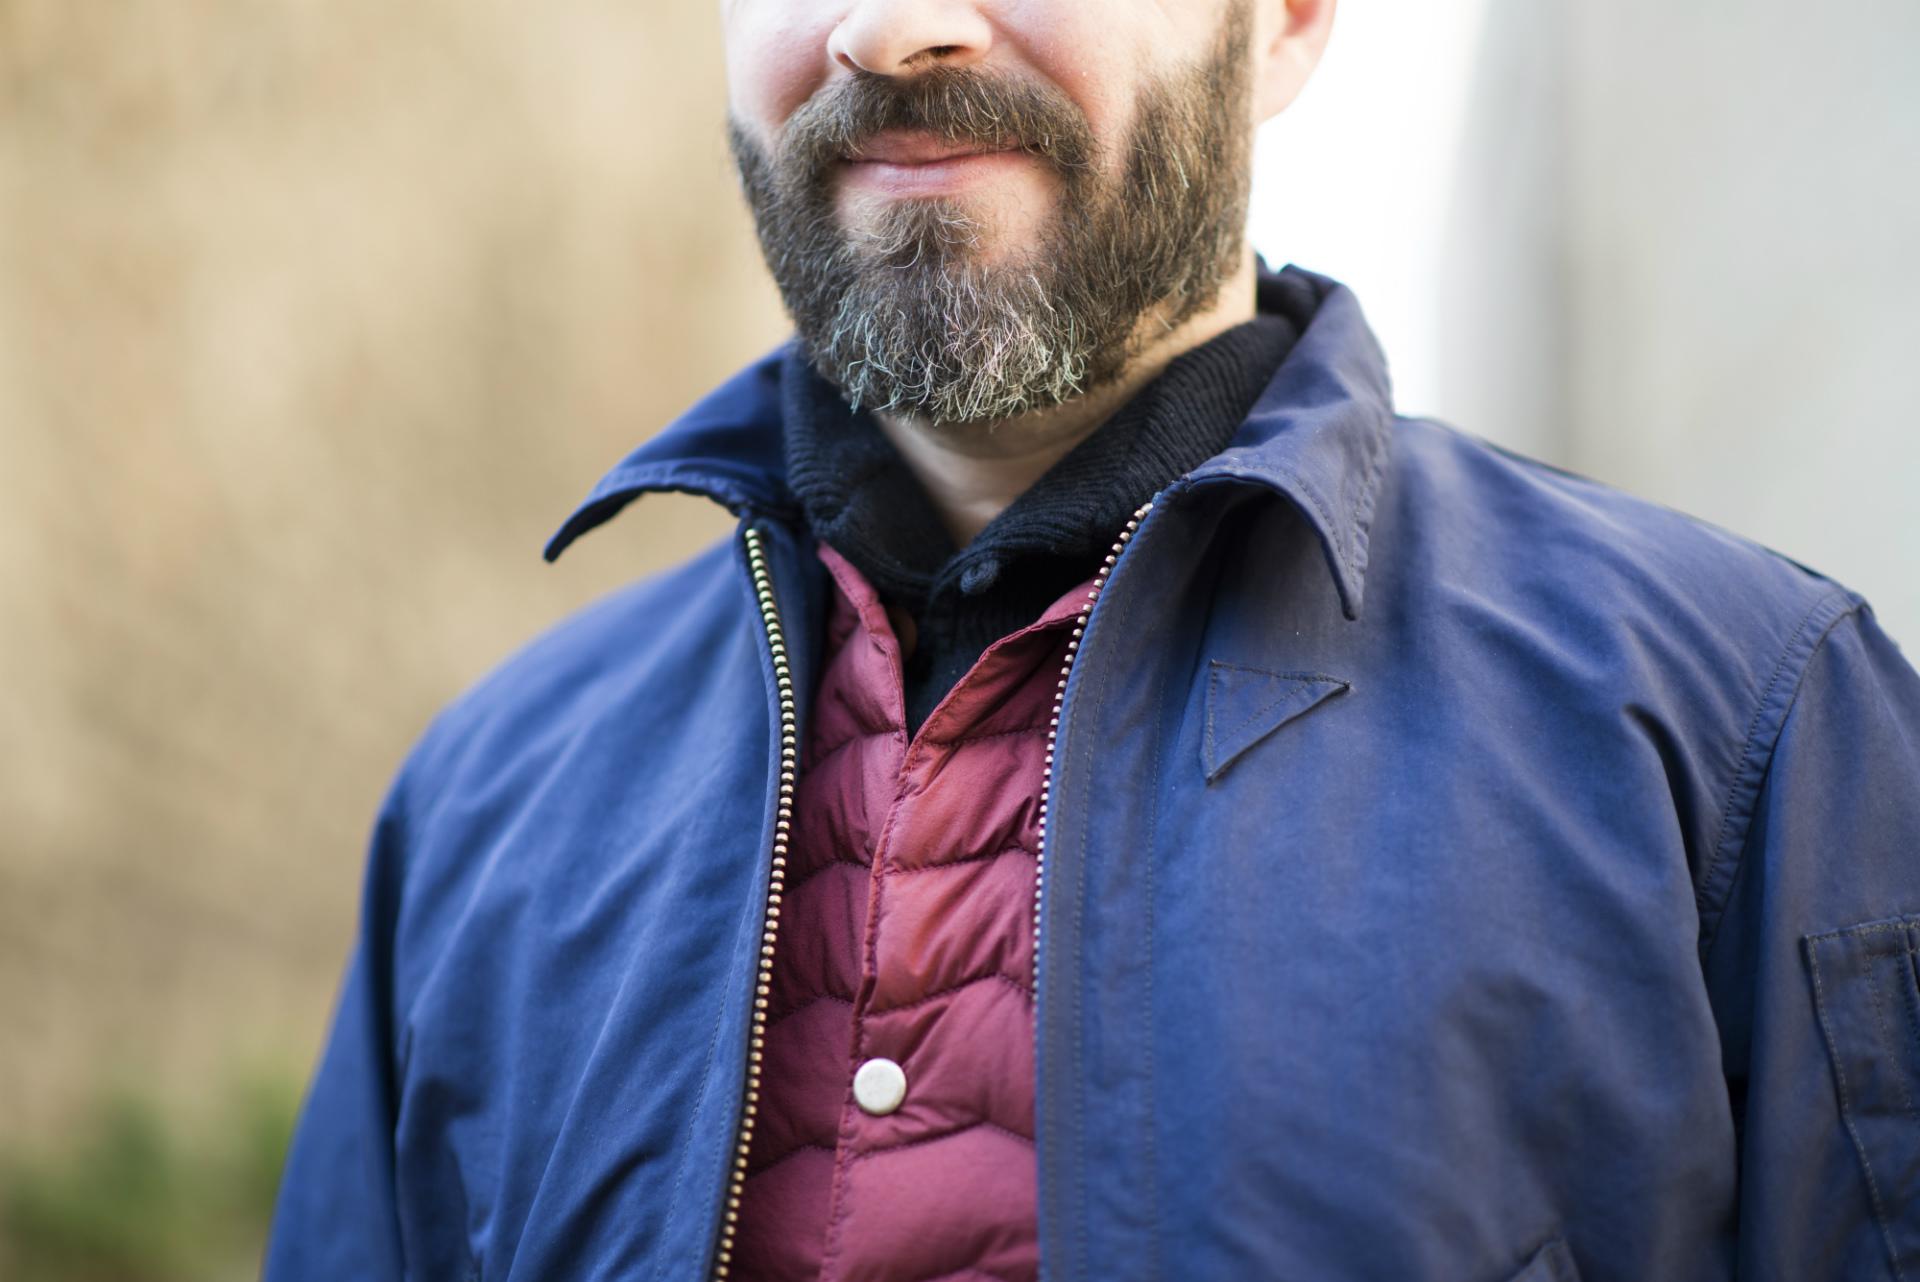 mida firenze tokyo menswear uomo giacca gilet abbigliamento